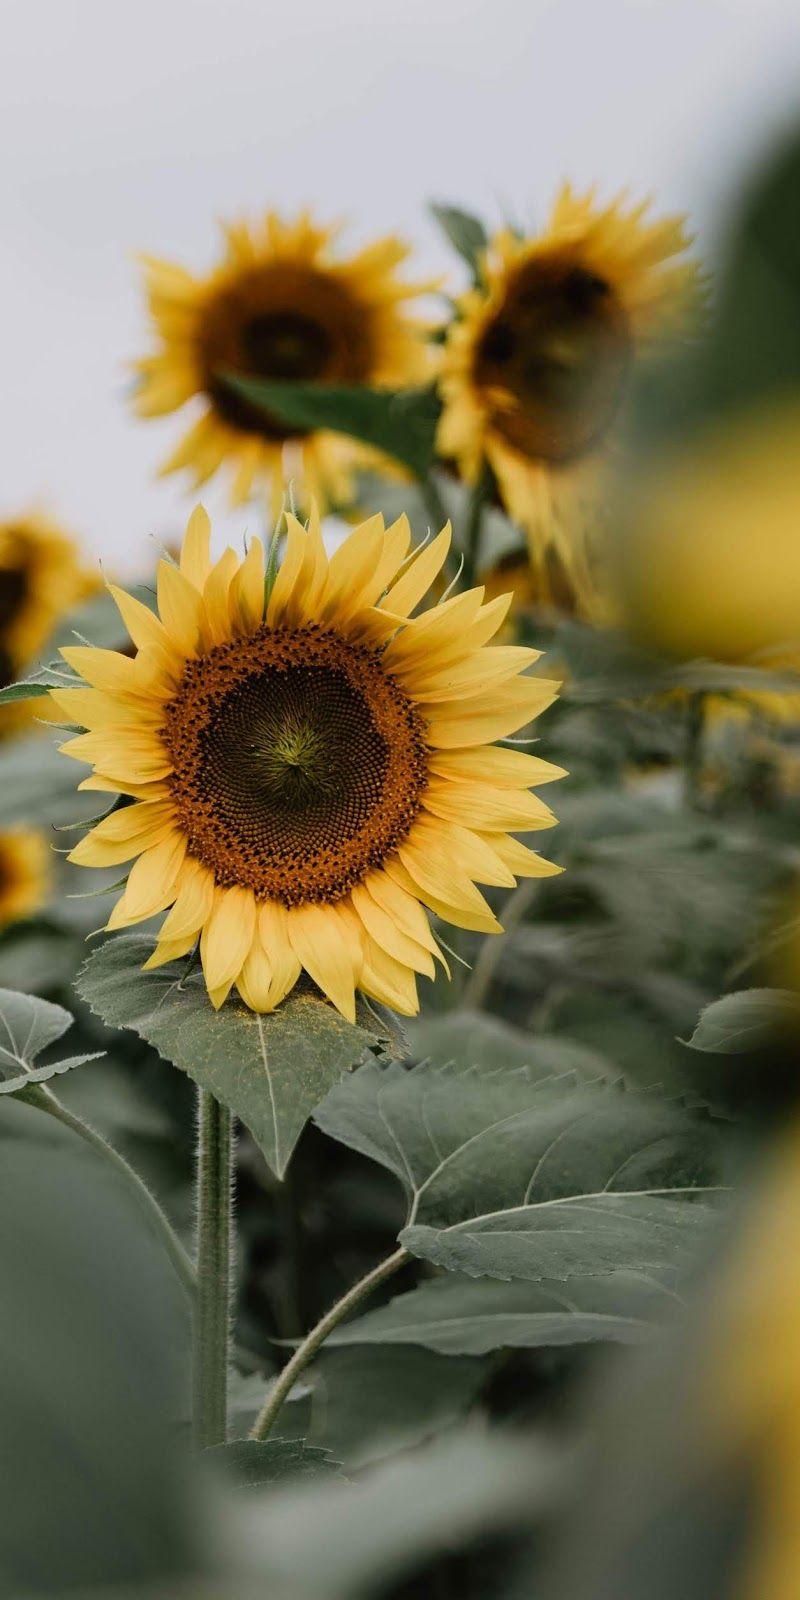 Sunflower Aesthetic Wullpapers Aesthetic Wallpapers